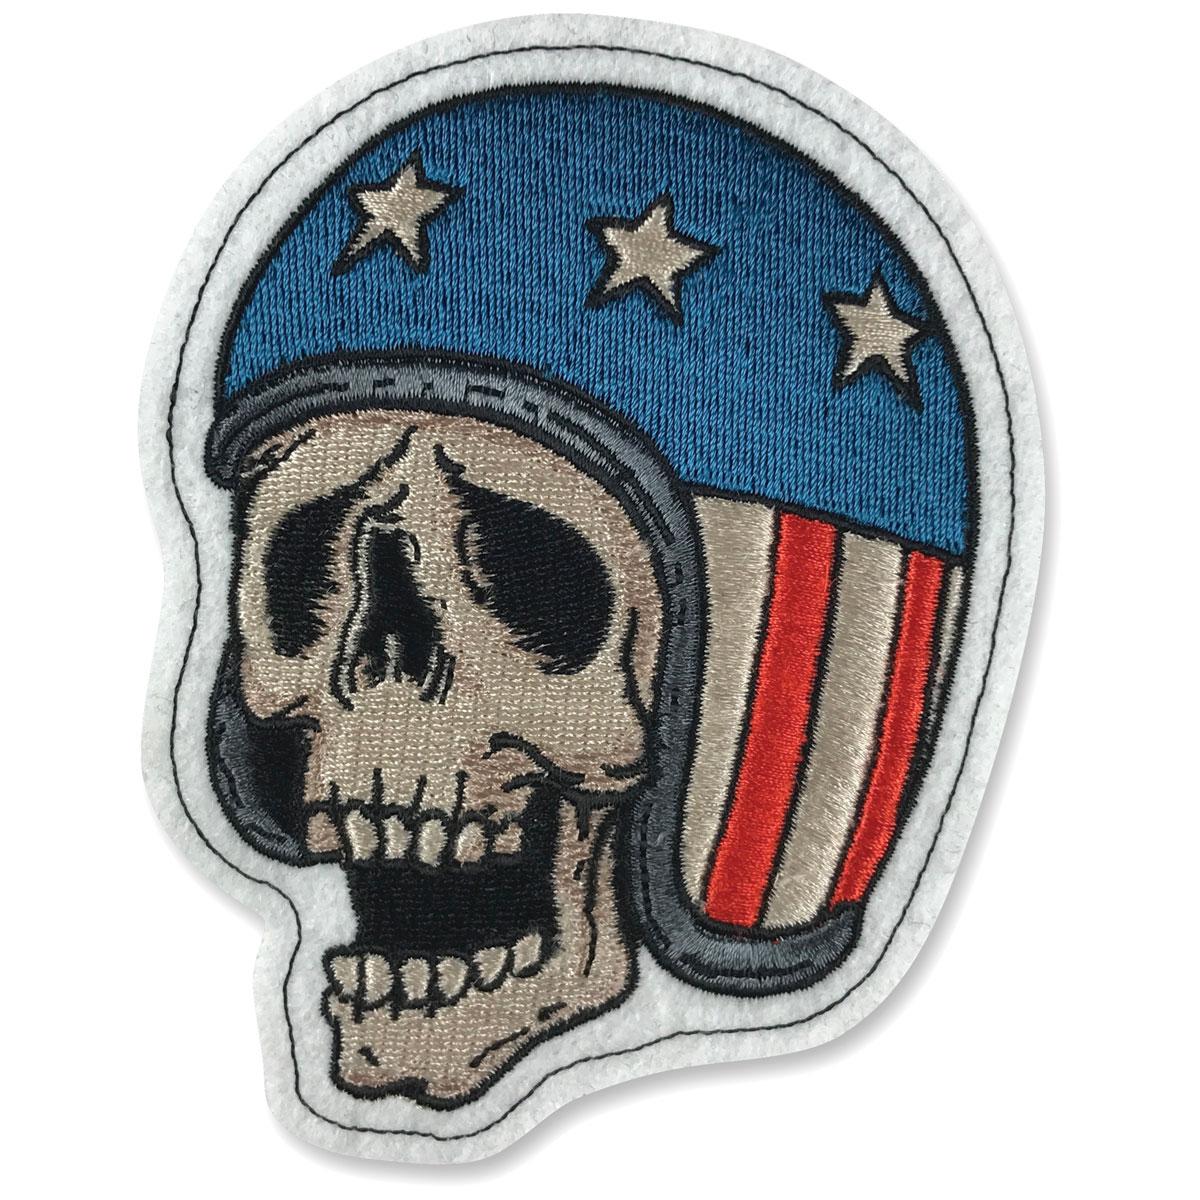 Lethal Threat Skull USA Helmet 3.75